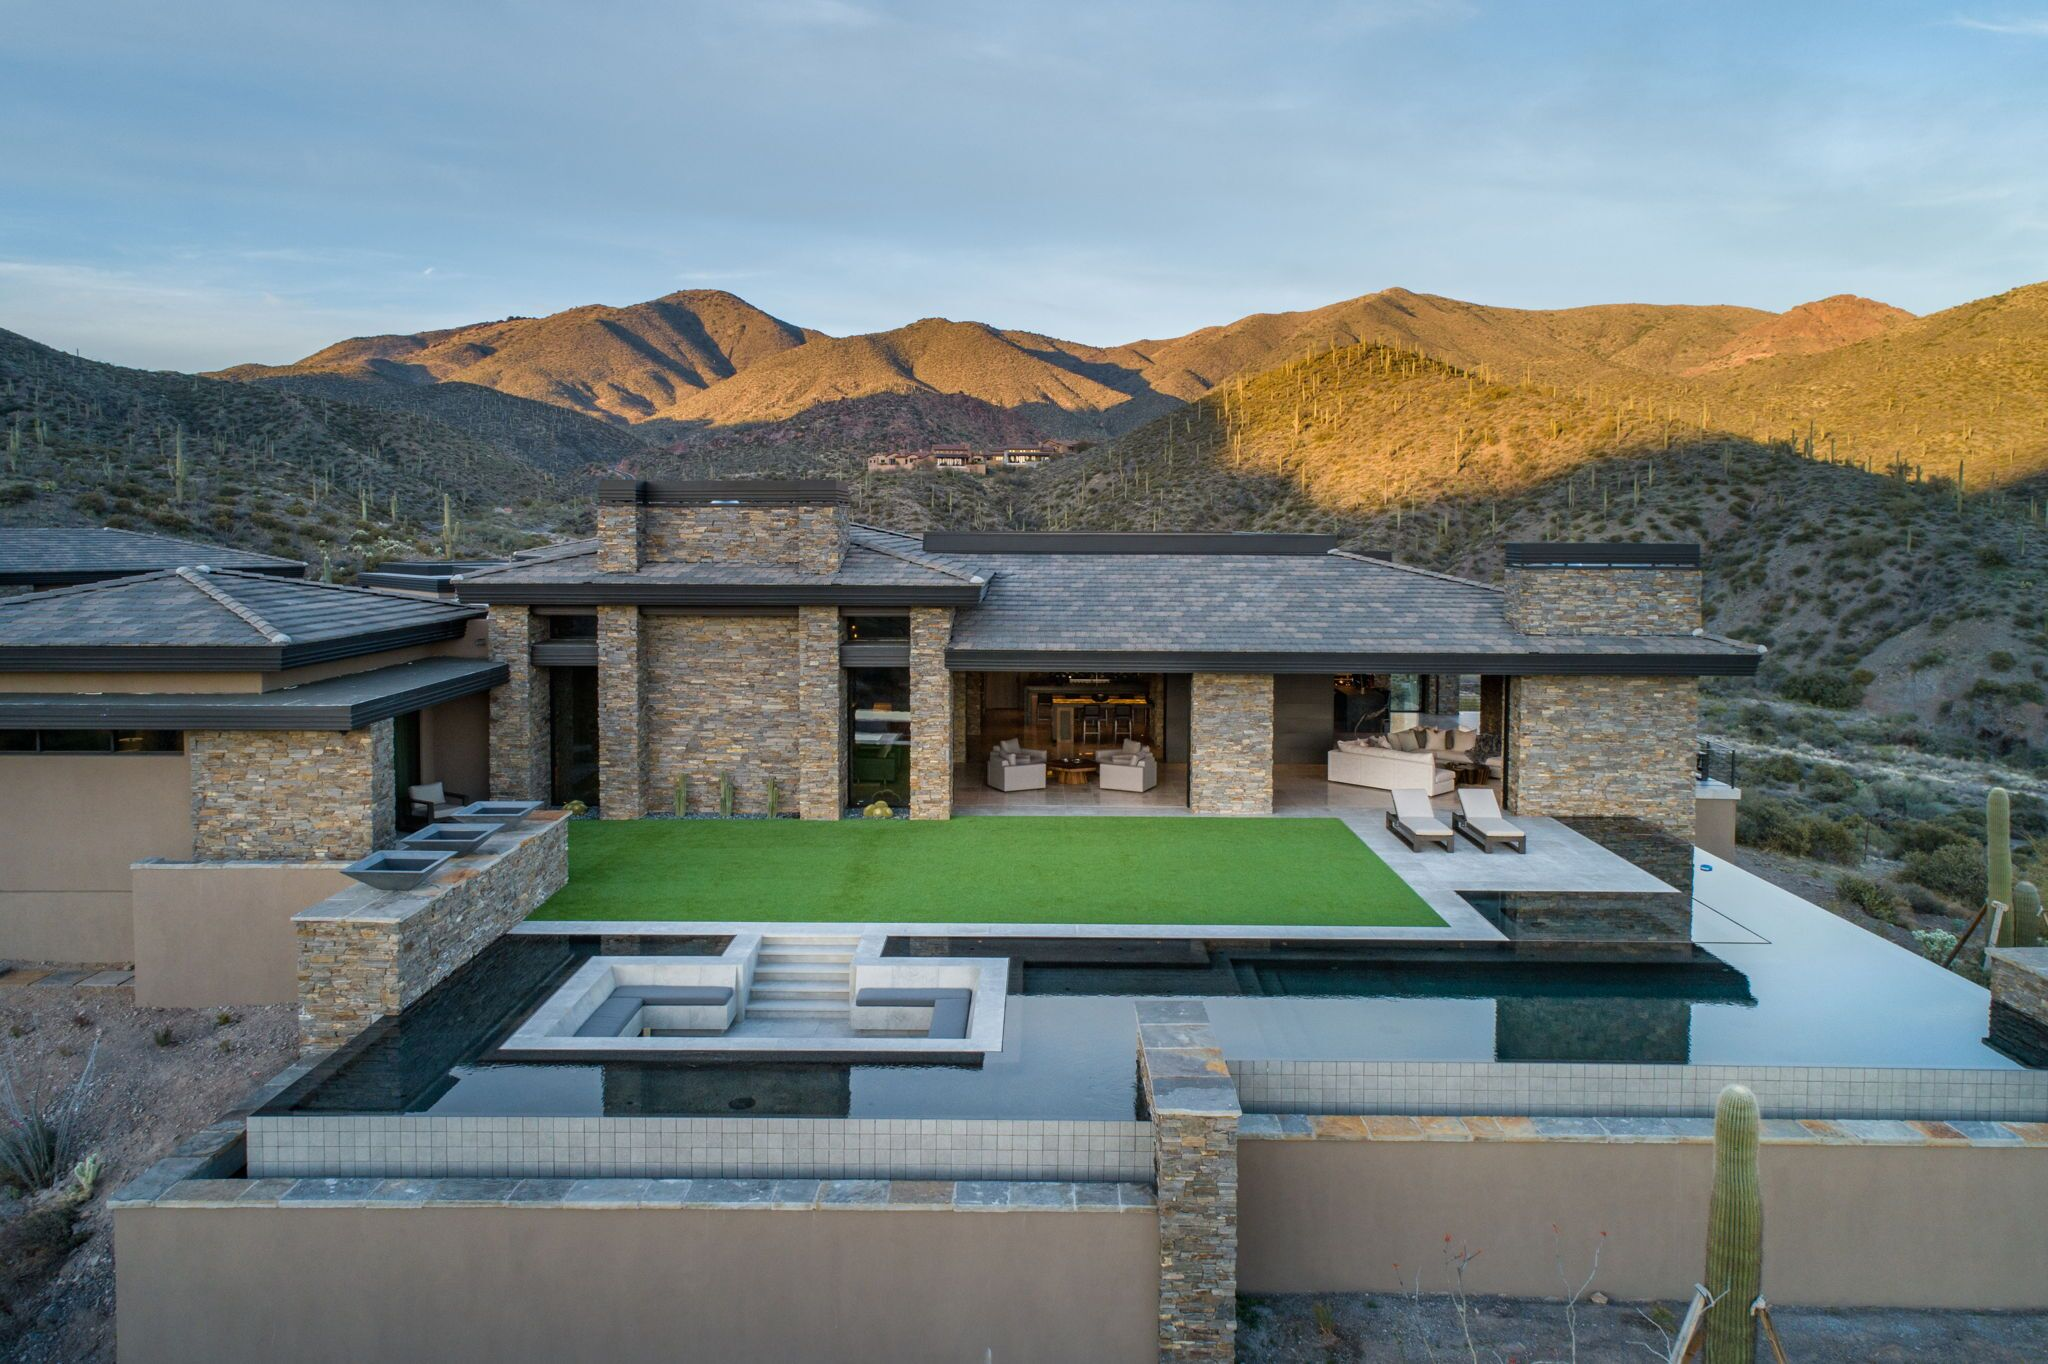 9300+E+Grapevine+Pass+Scottsdale-61-WebQuality-Architectural+Details.jpg